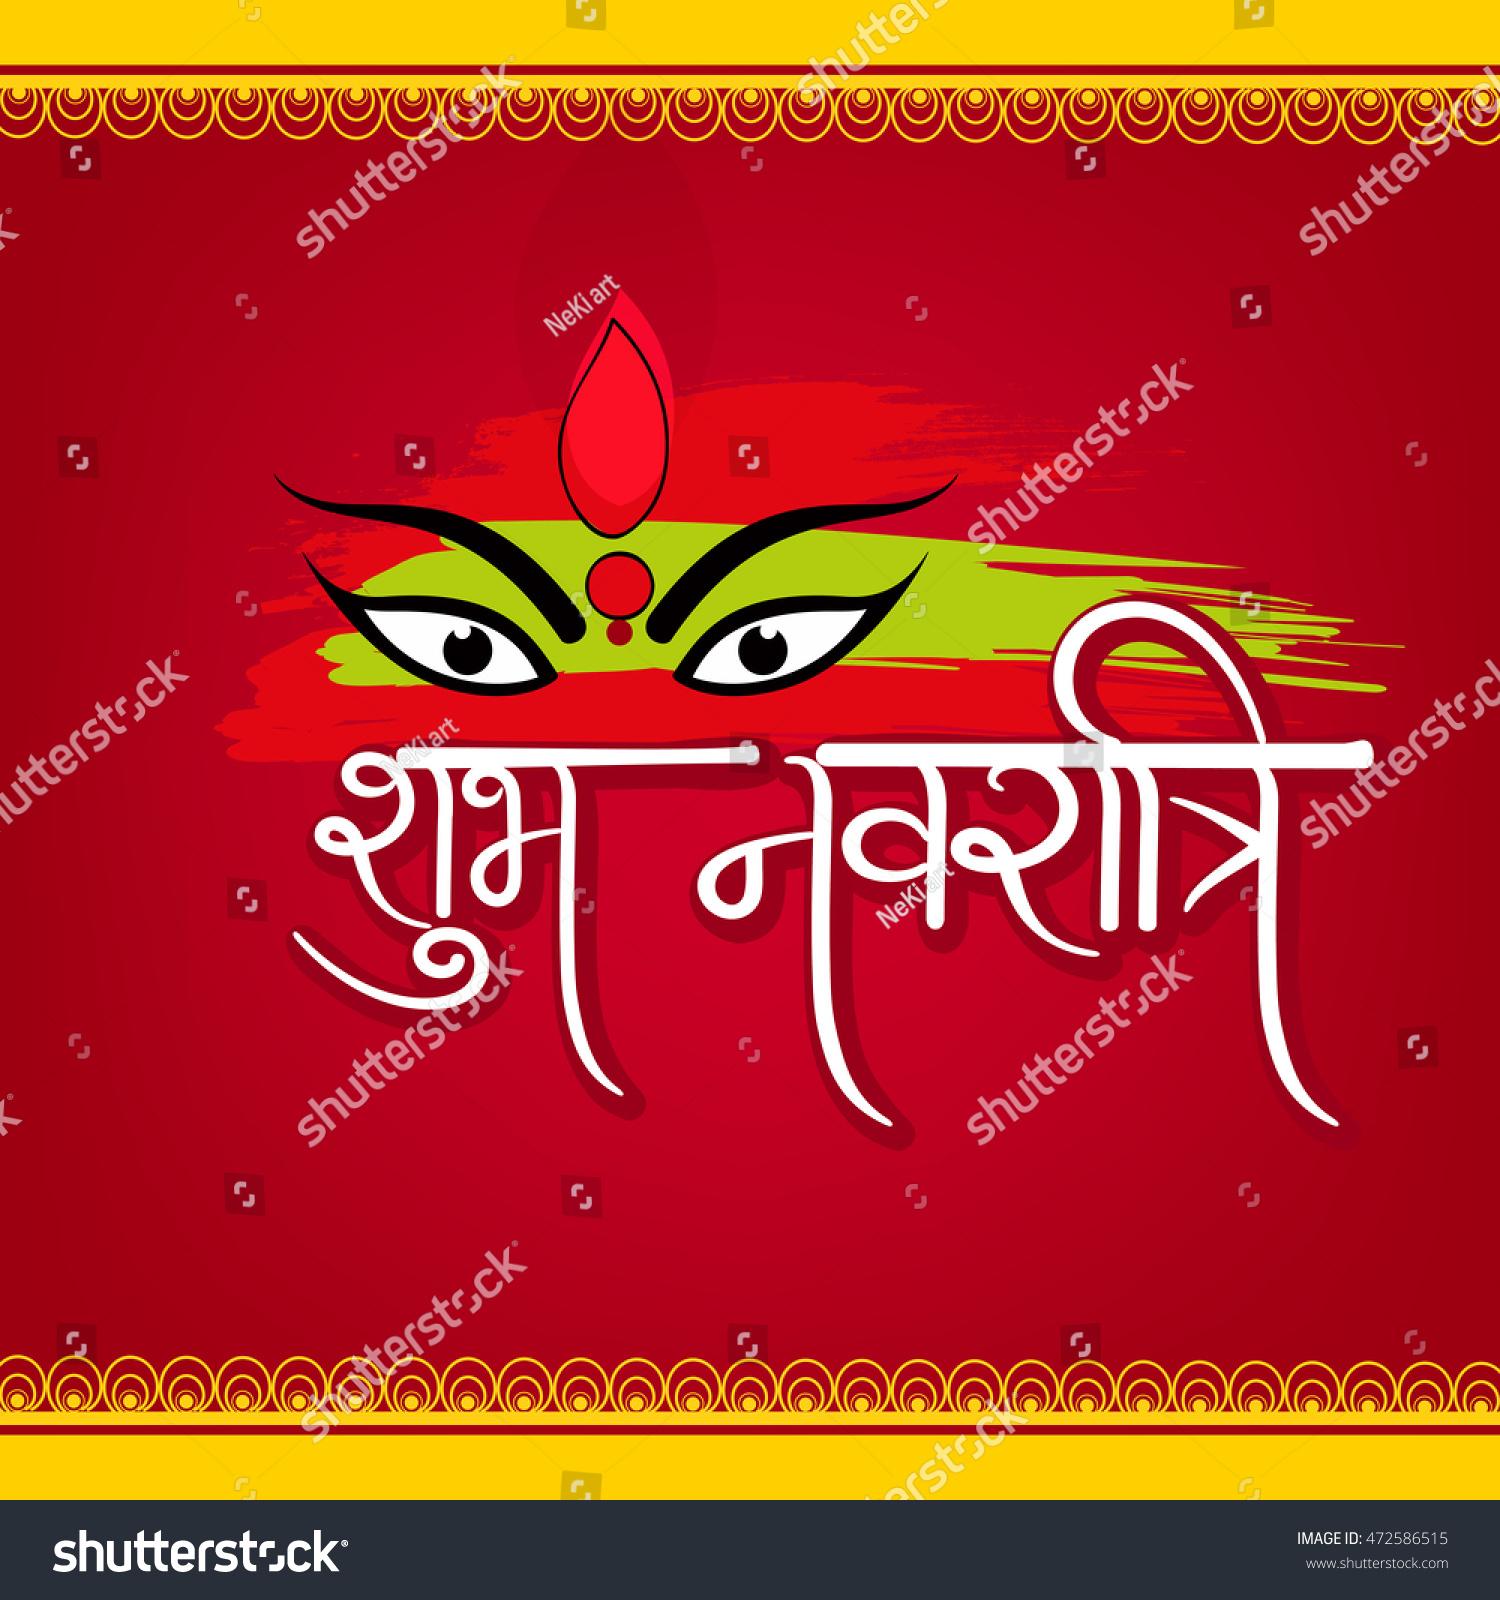 Beautiful Greeting Card Wallpaper Design Hindi Stock Vector